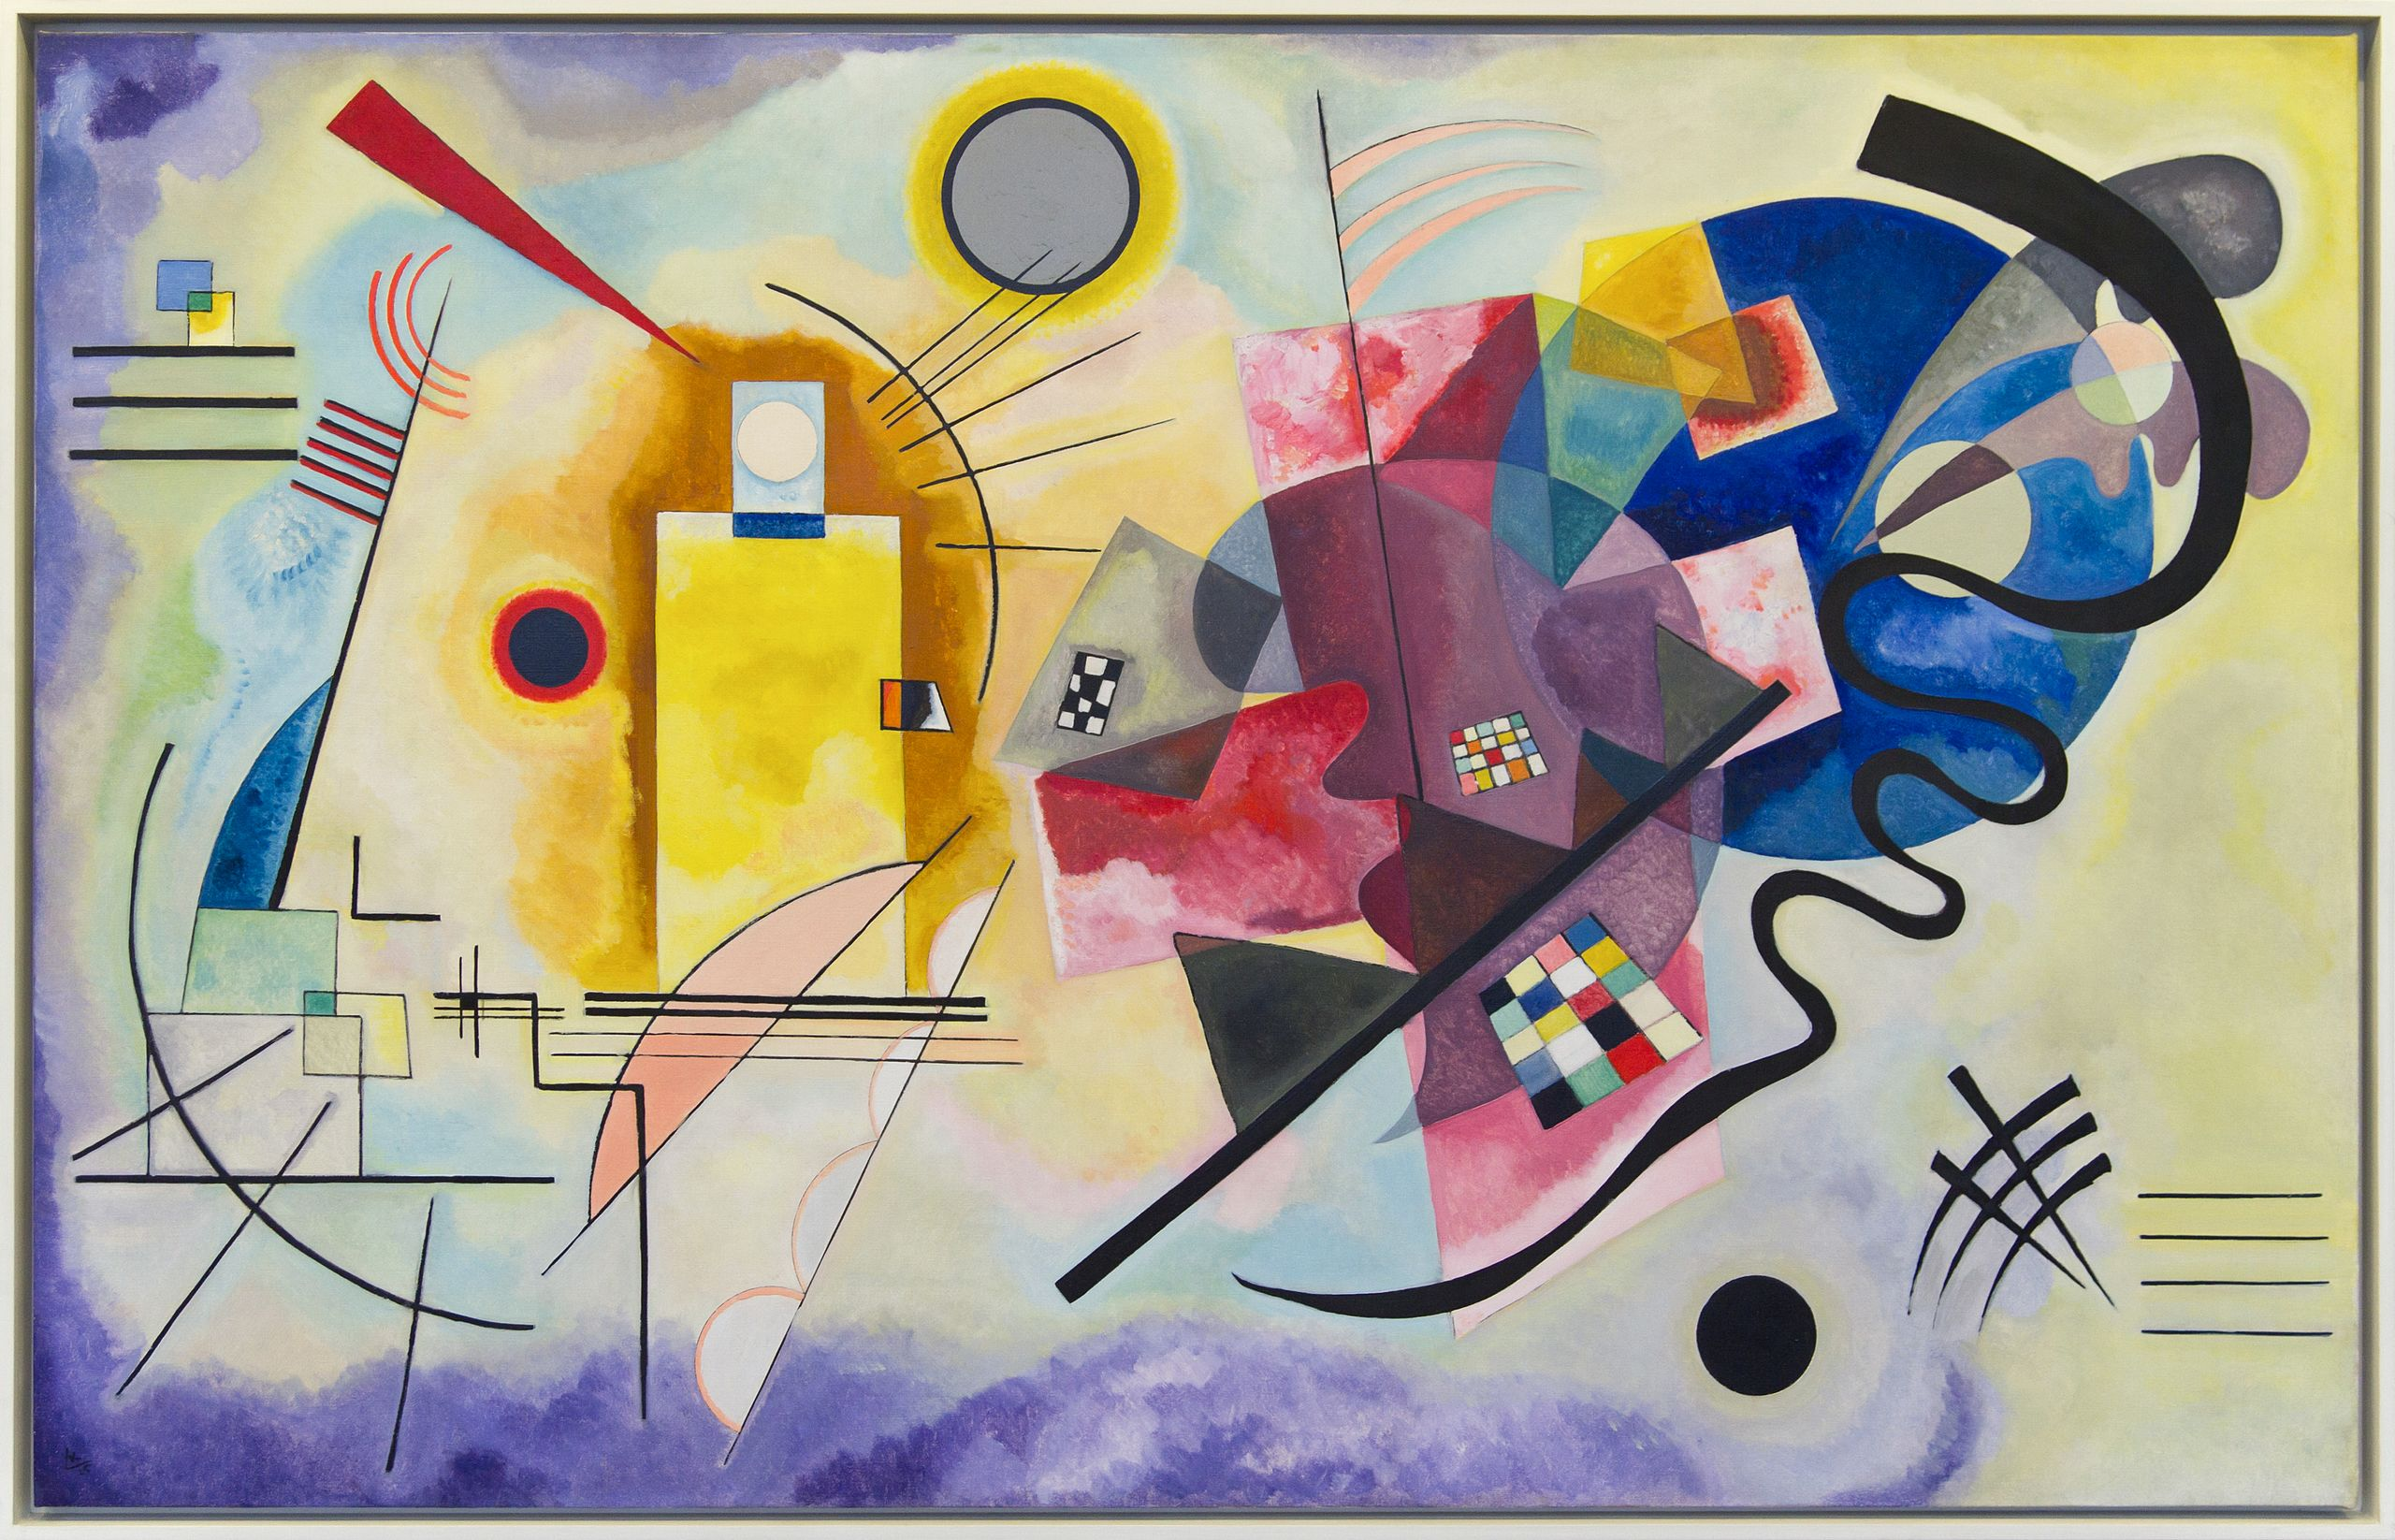 18. Giallo, rosso, blu - Vasilij Kandinskij (1925) - Centre Pompidou, Parigi